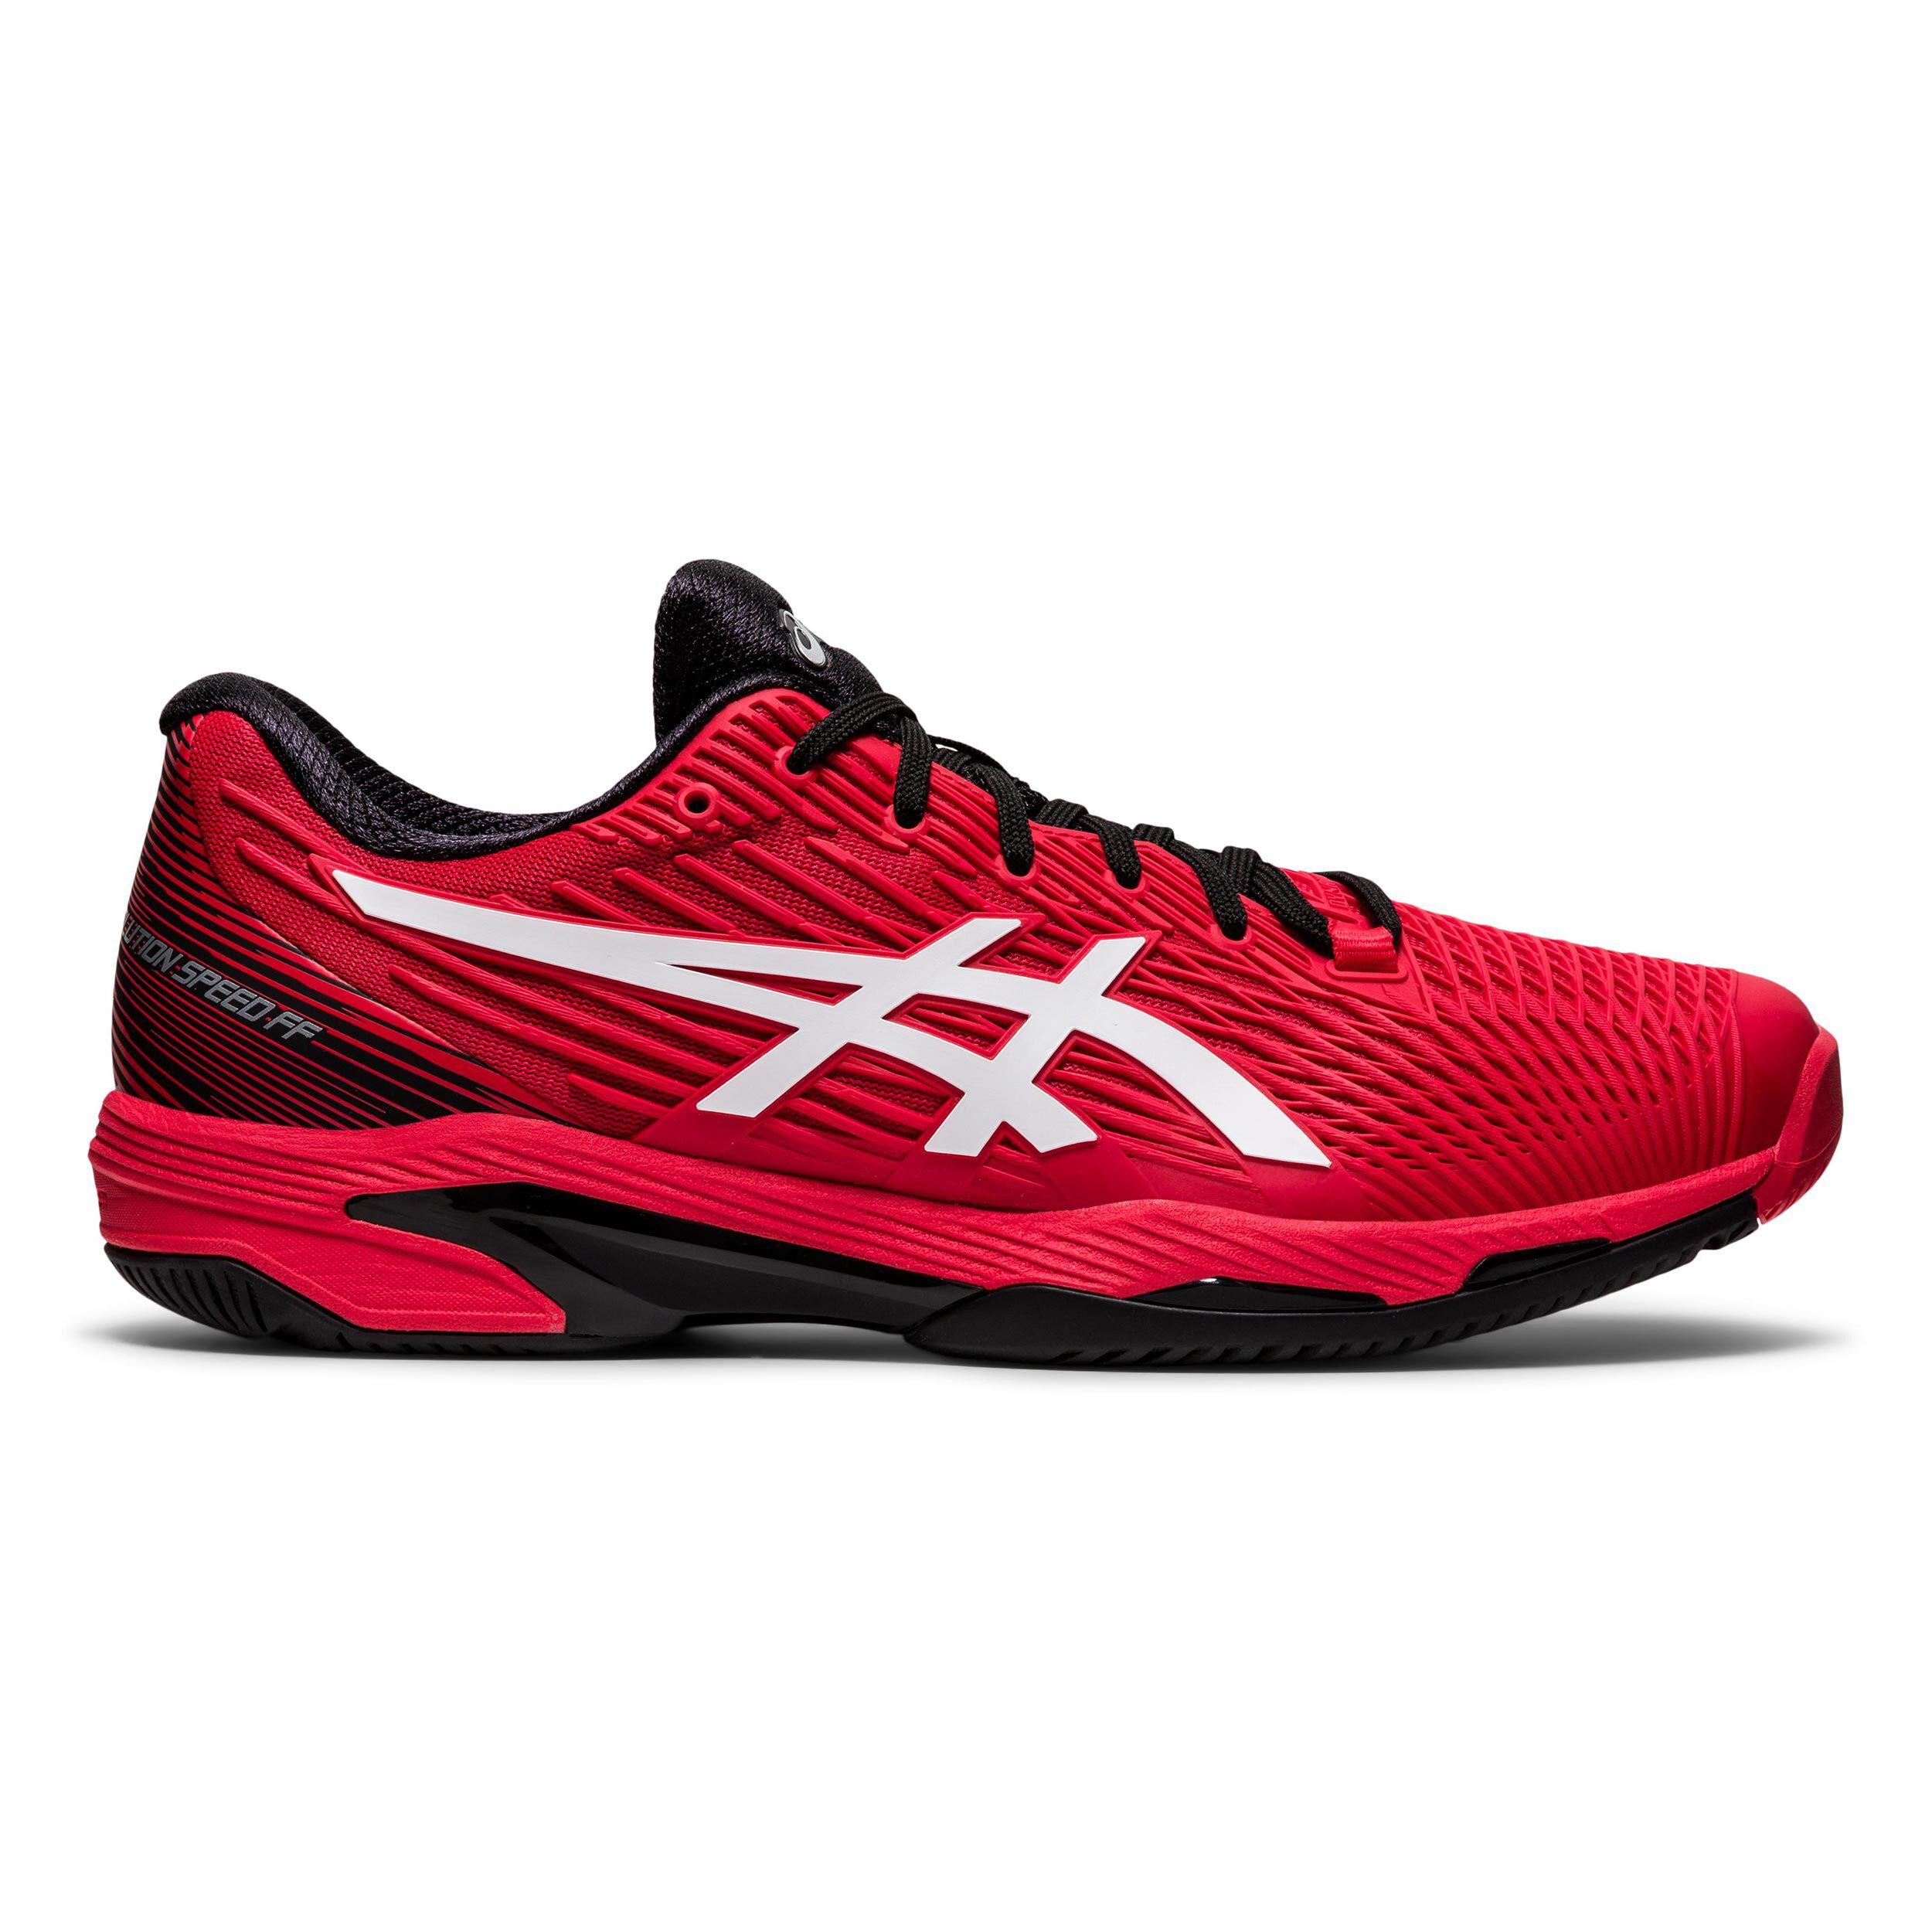 Chaussures de tennis de Asics acheter en ligne   Tennis-Point